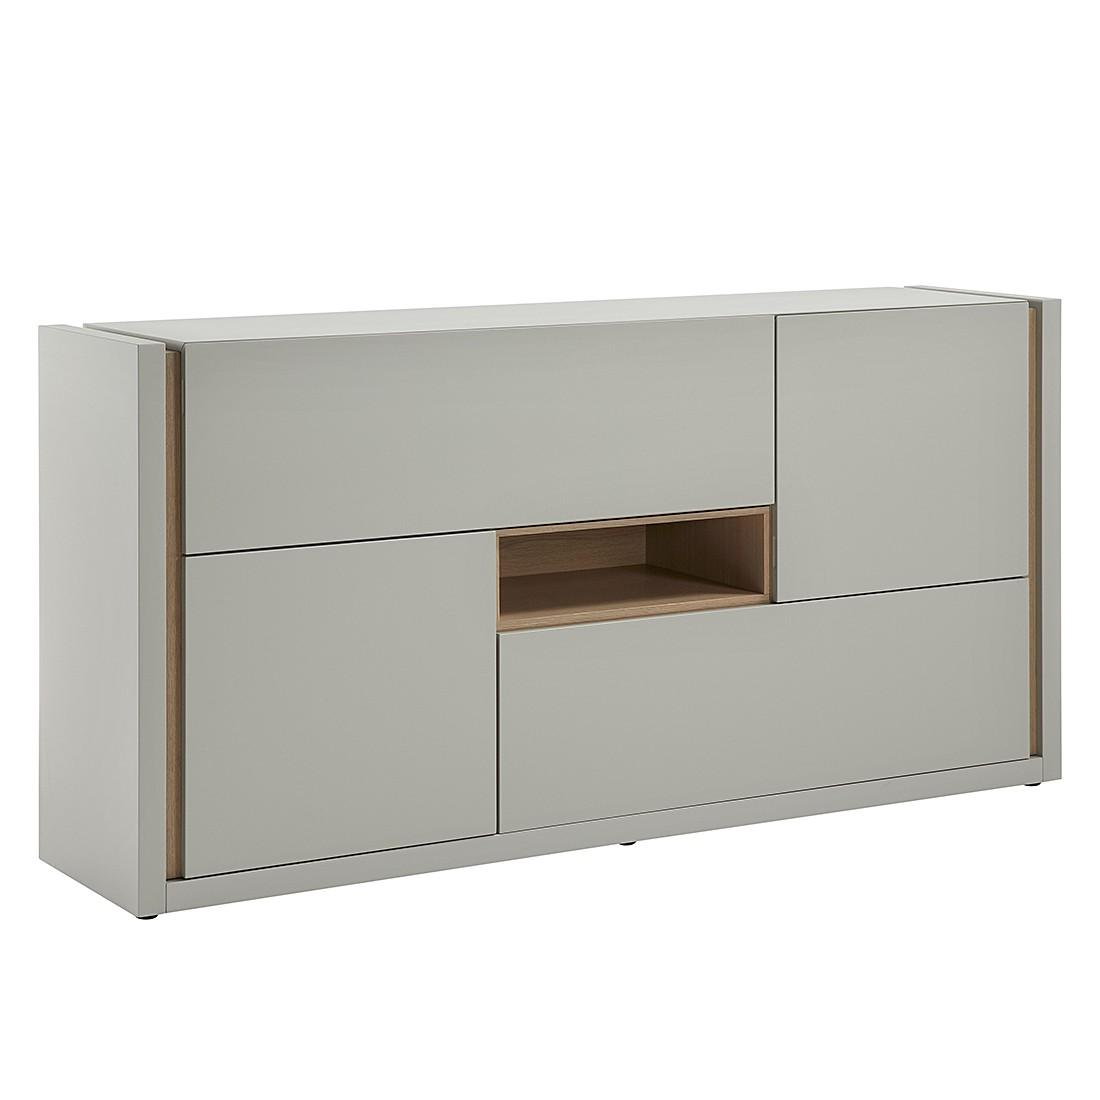 sideboard thule ii matt grau loftscape g nstig. Black Bedroom Furniture Sets. Home Design Ideas